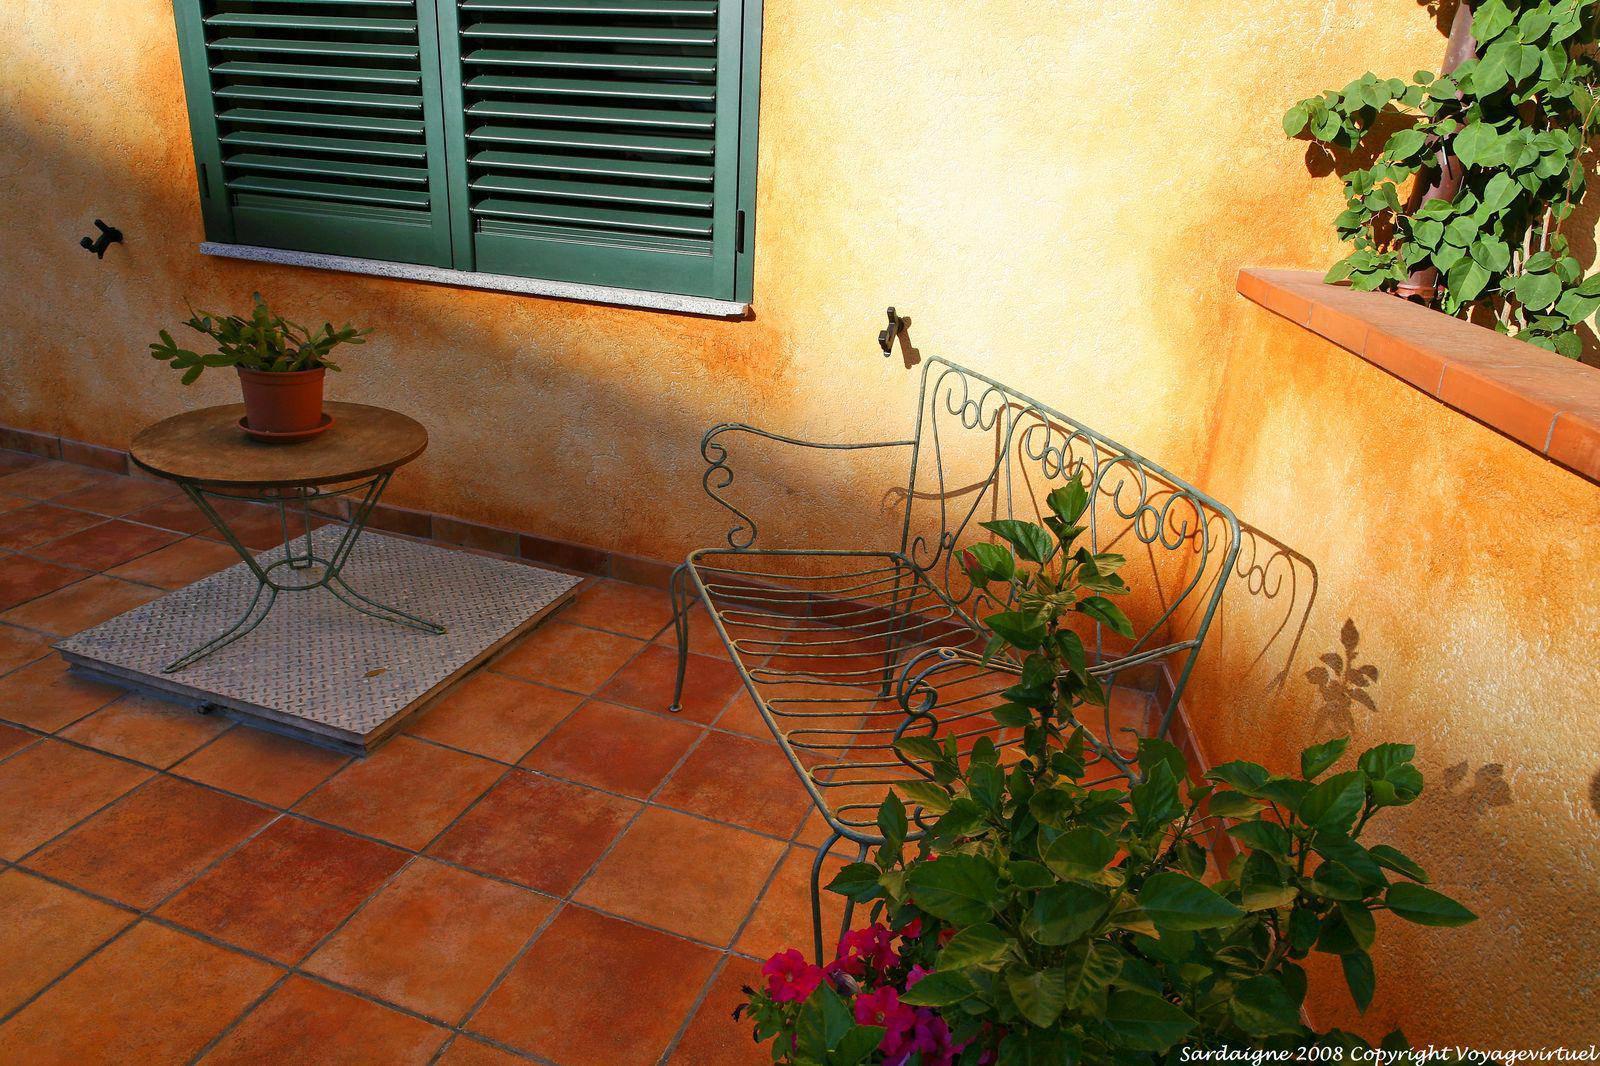 Luogosanto via san trano arredamento balconcino sardegna for Arredamento sardegna